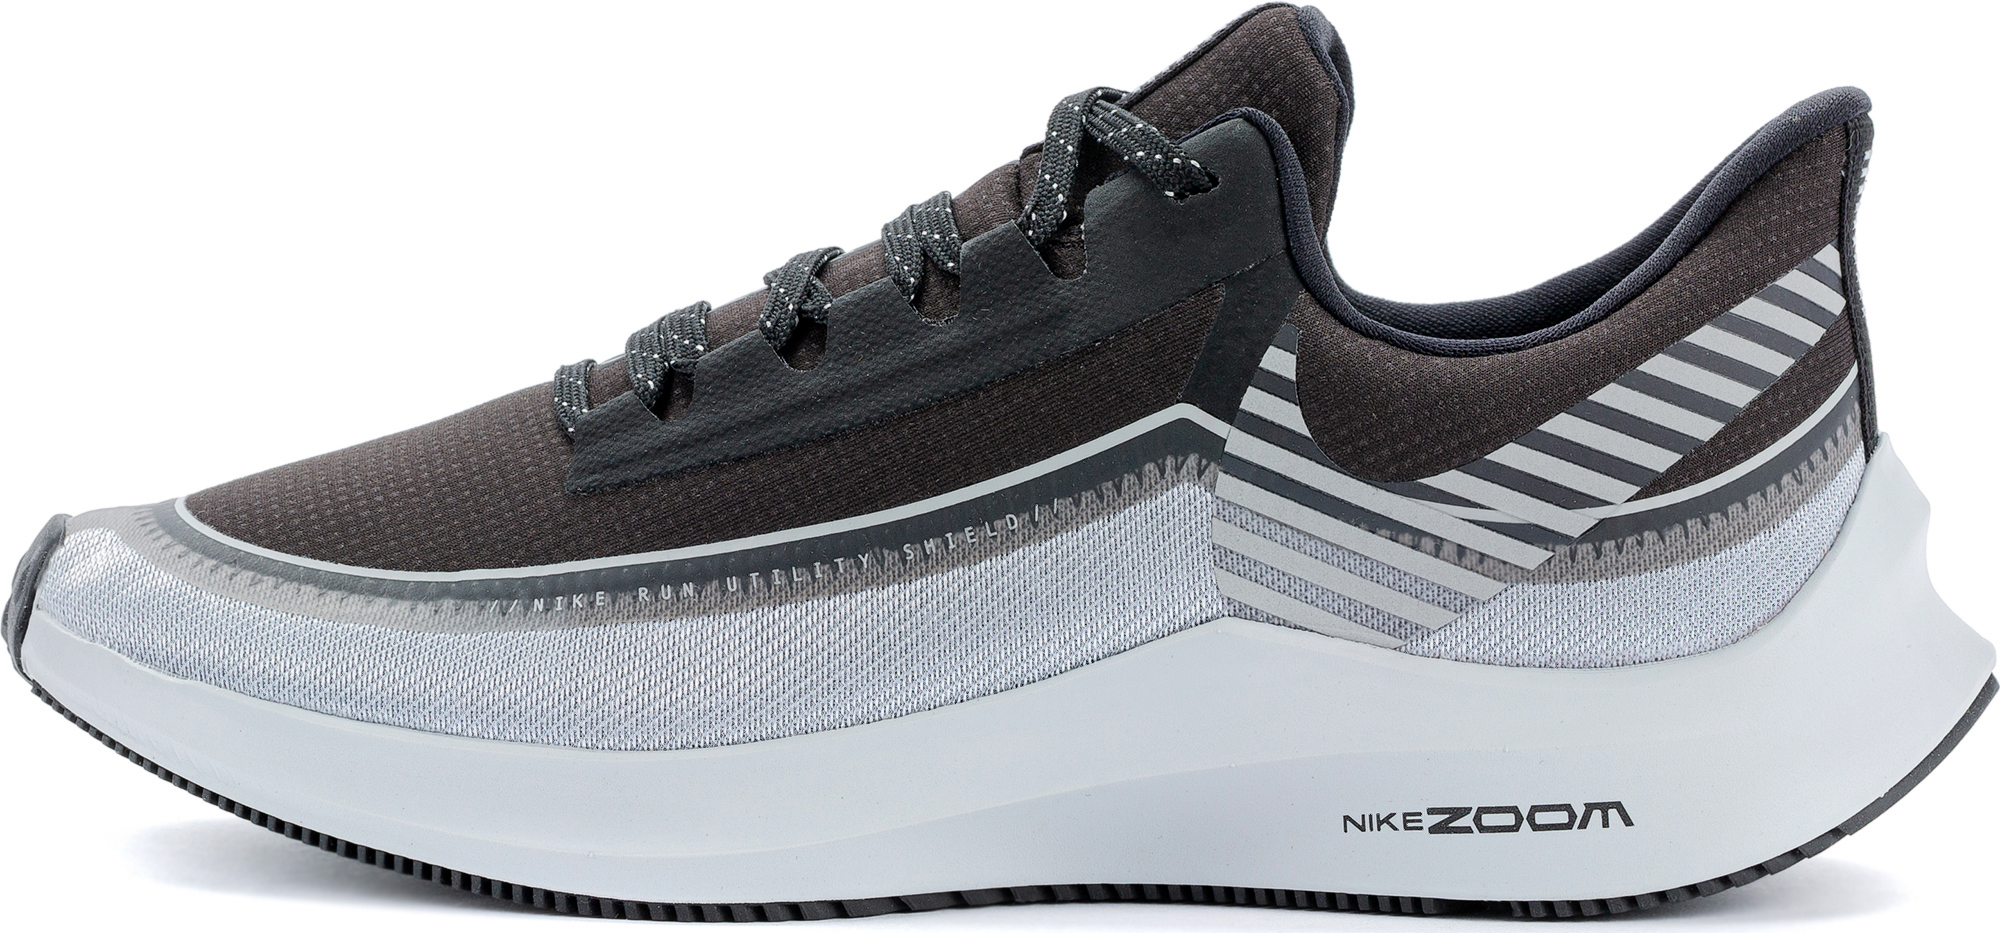 Nike Кроссовки женские Zoom Winflo 6, размер 38